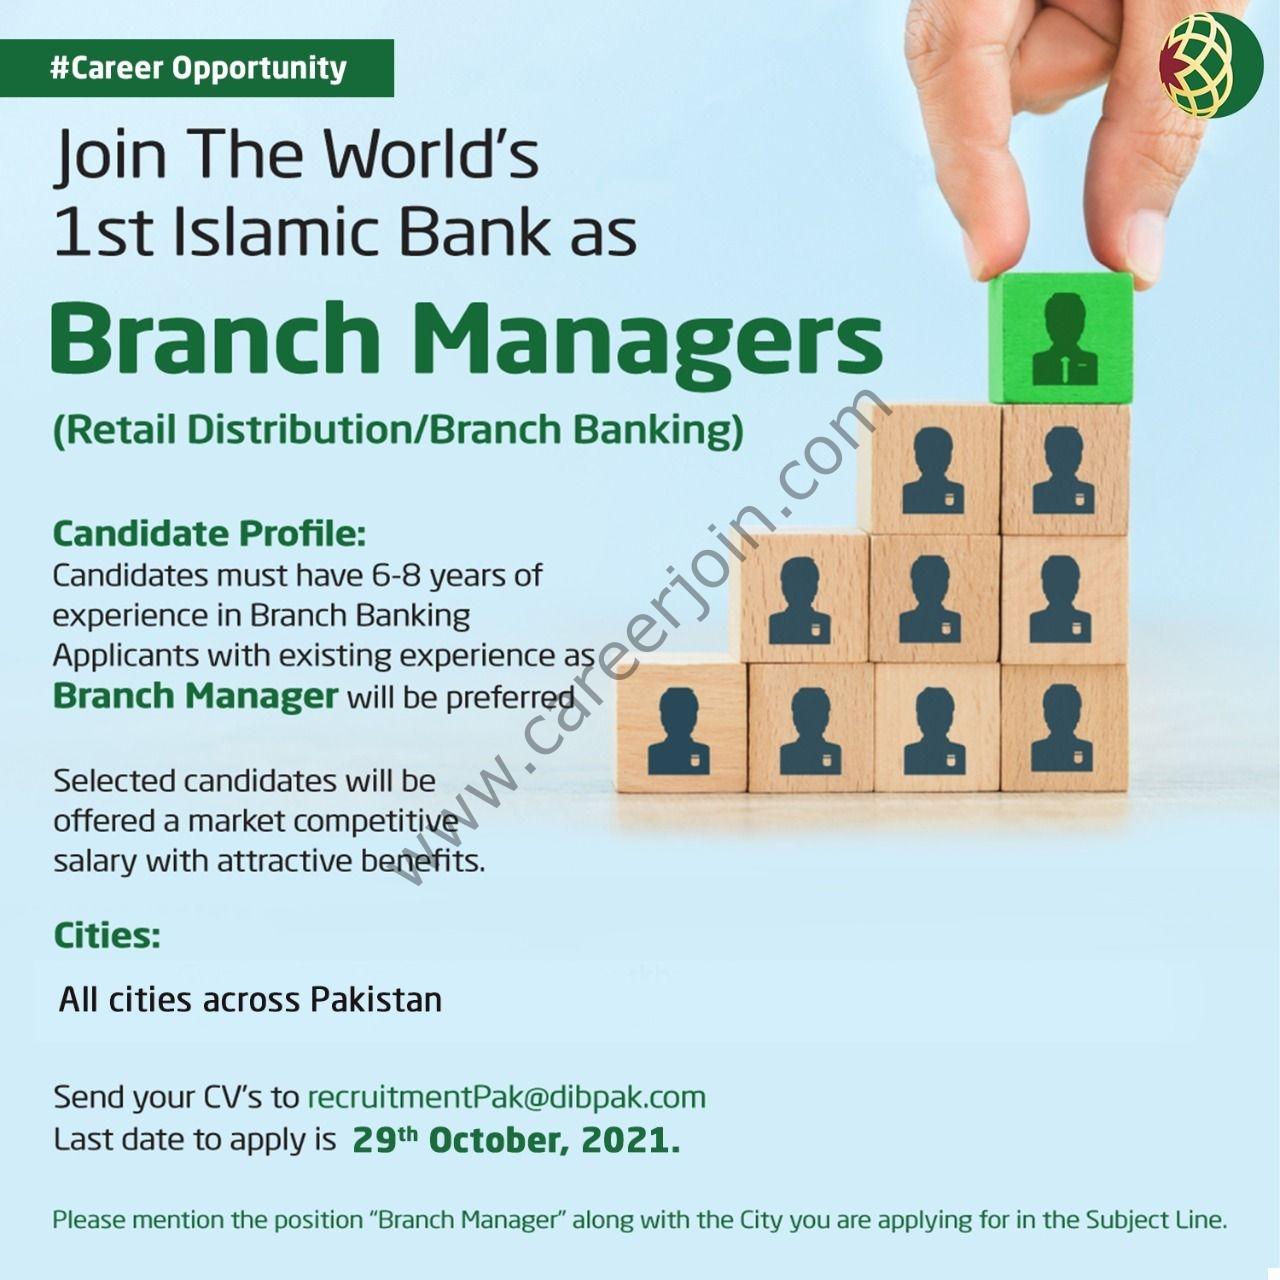 Dubai Islamic Bank Pakistan Limited DIBP Jobs Branch Managers